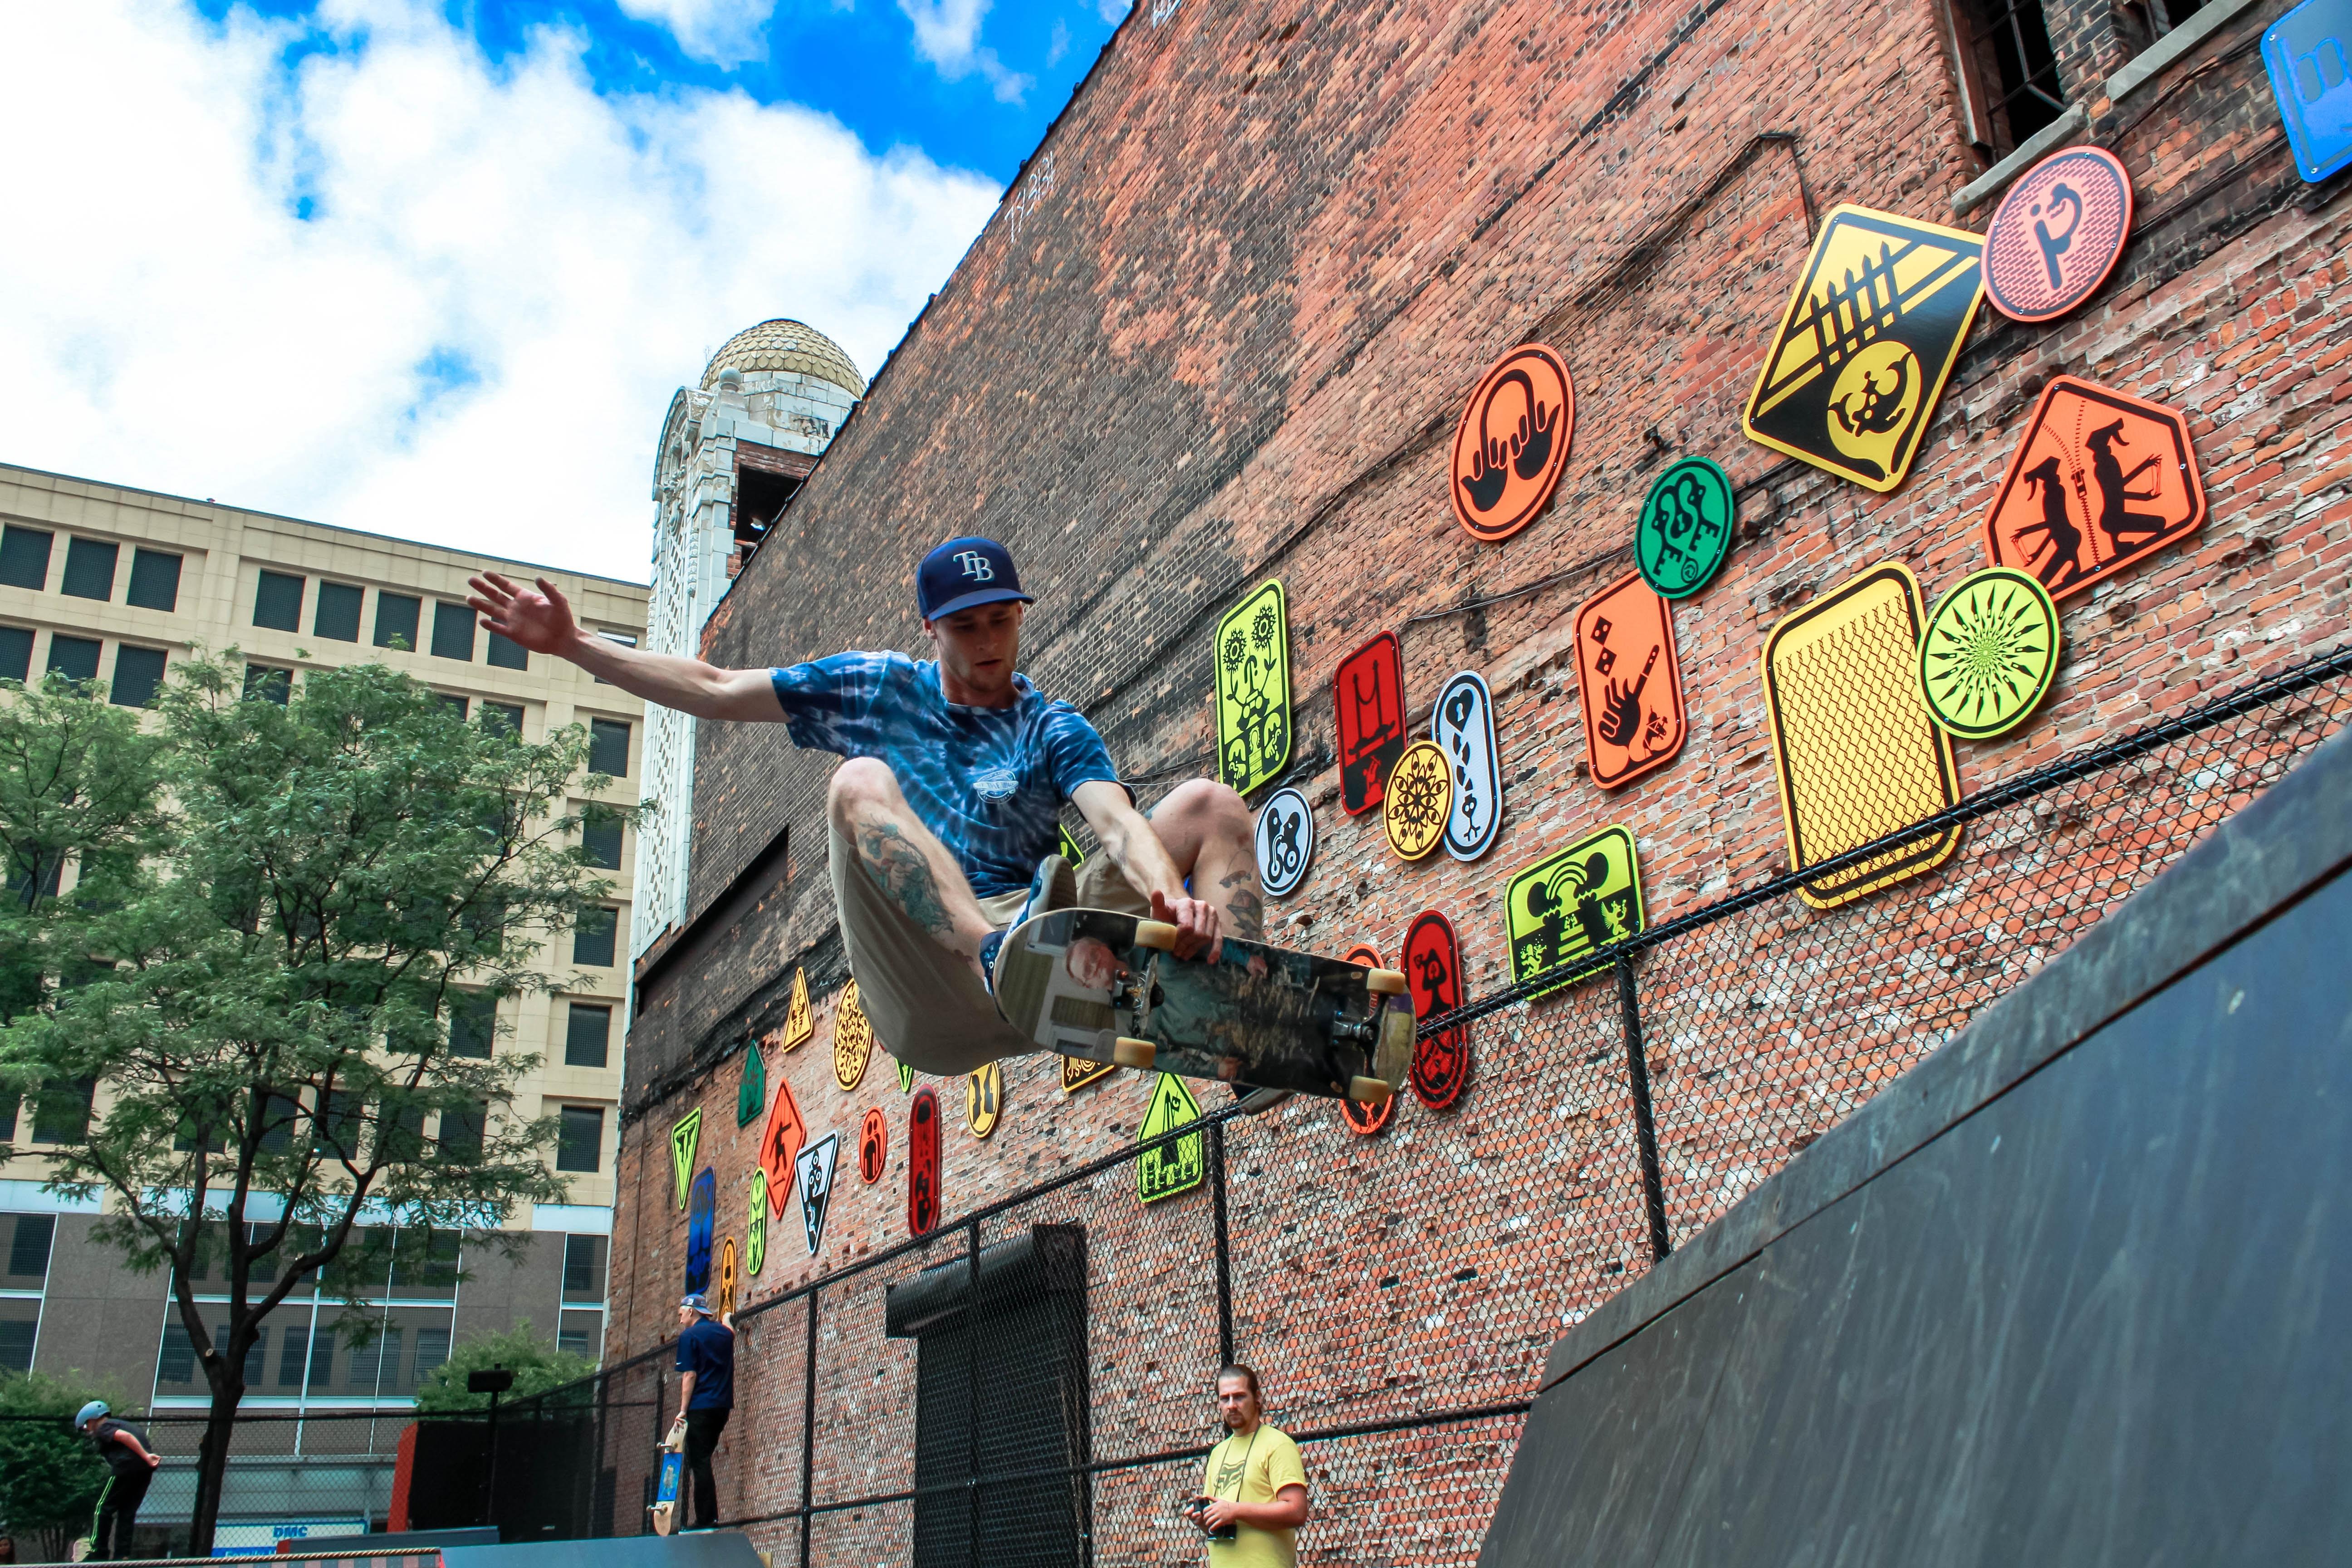 man skateboarding near brown concrete building during daytime